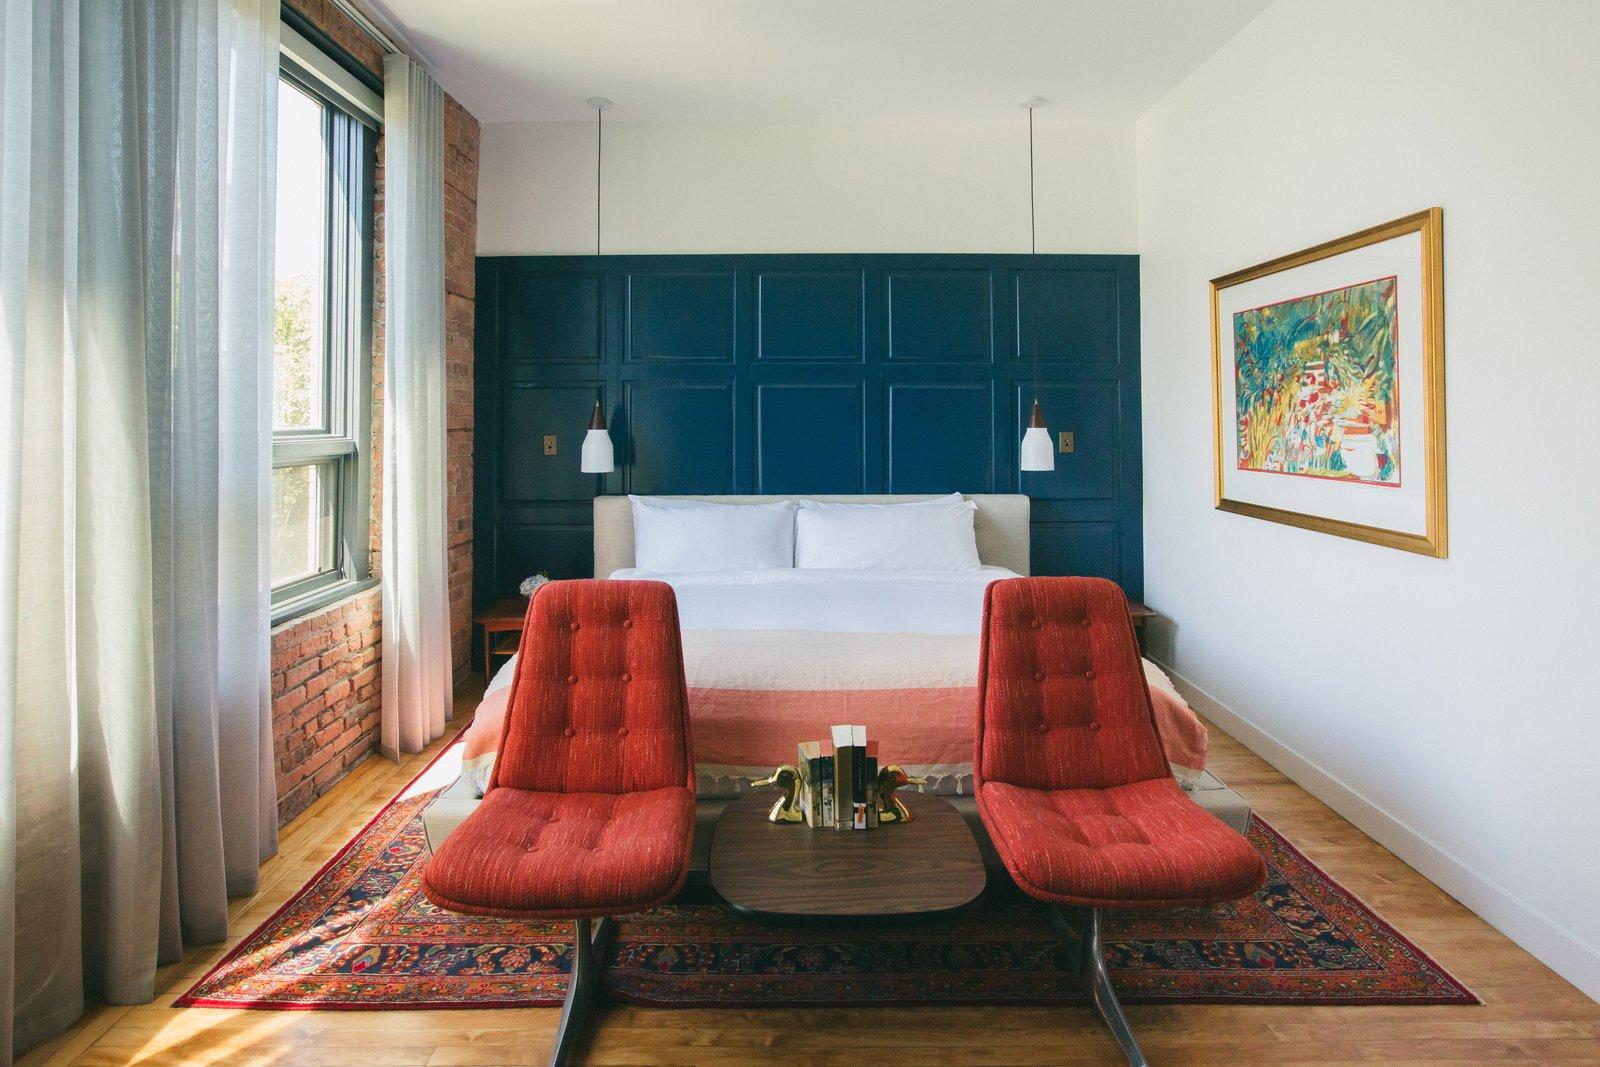 Bedroom, Ceiling Lighting, Medium Hardwood Floor, Bed, Pendant Lighting, and Chair Bellow Room  Best Photos from The Publishing House Bed & Breakfast